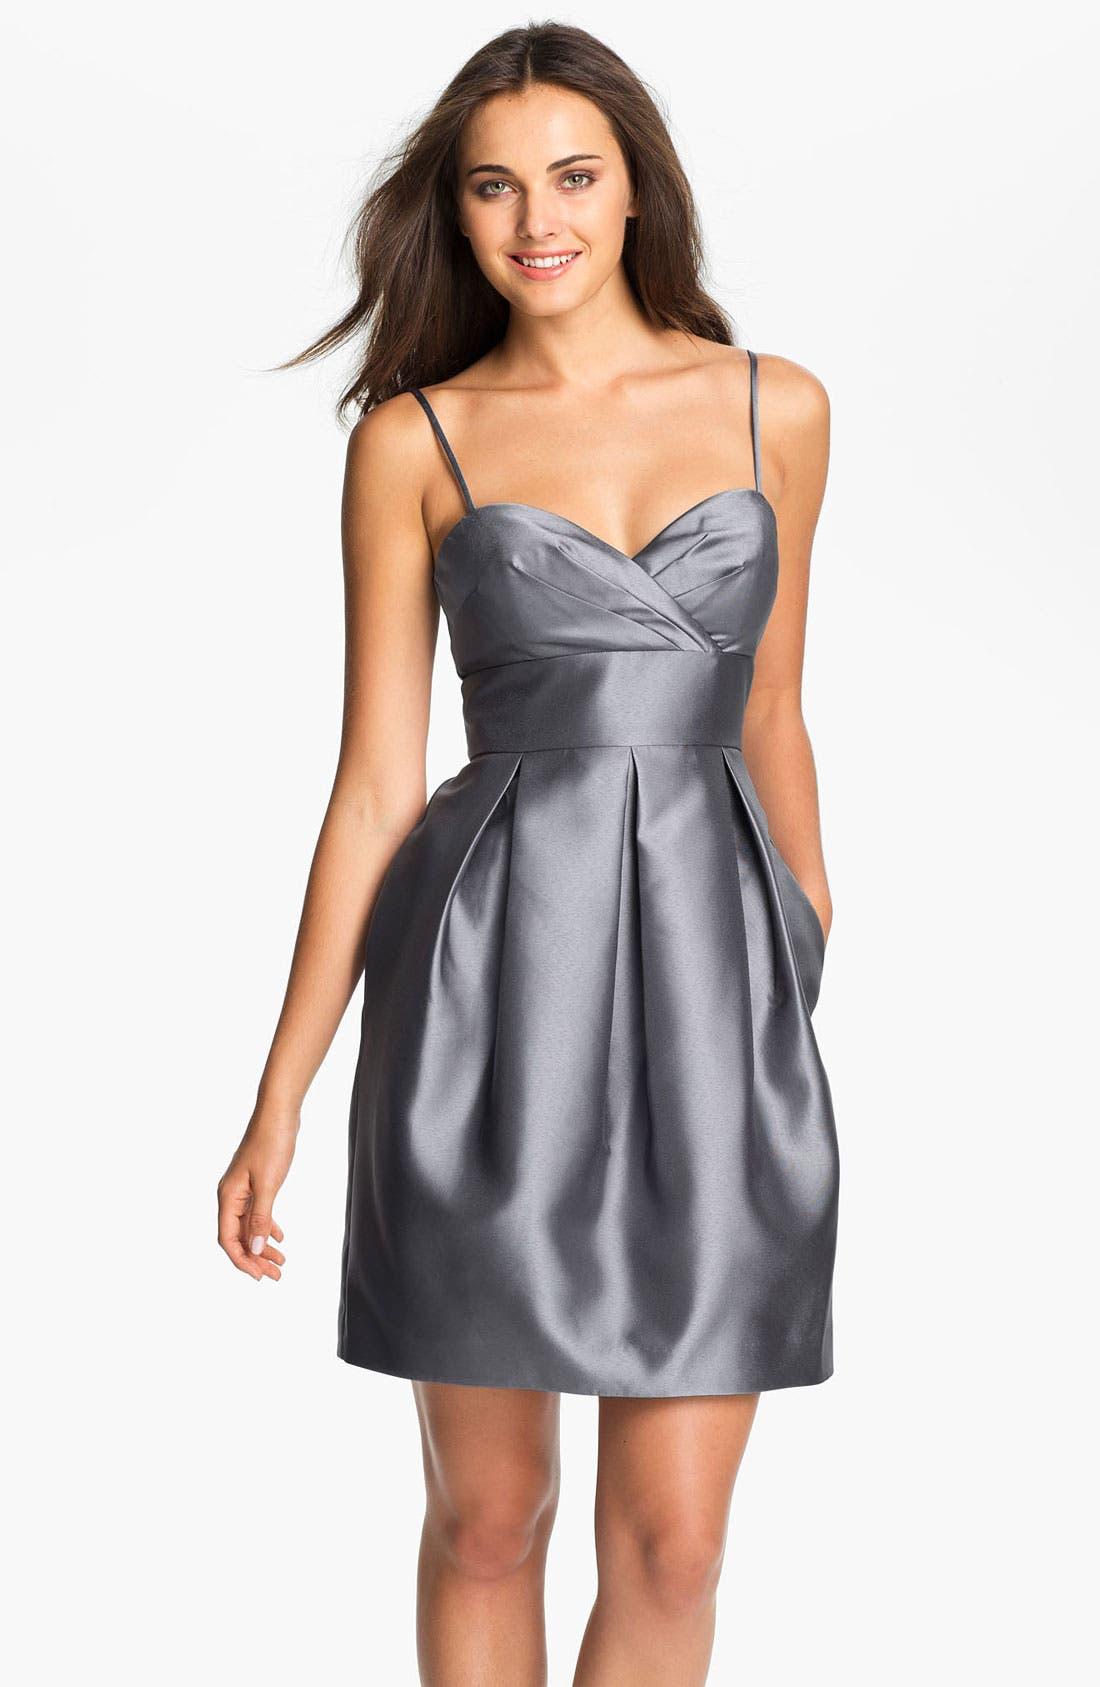 Alternate Image 1 Selected - Eliza J Sweetheart Neckline Taffeta Tulip Dress